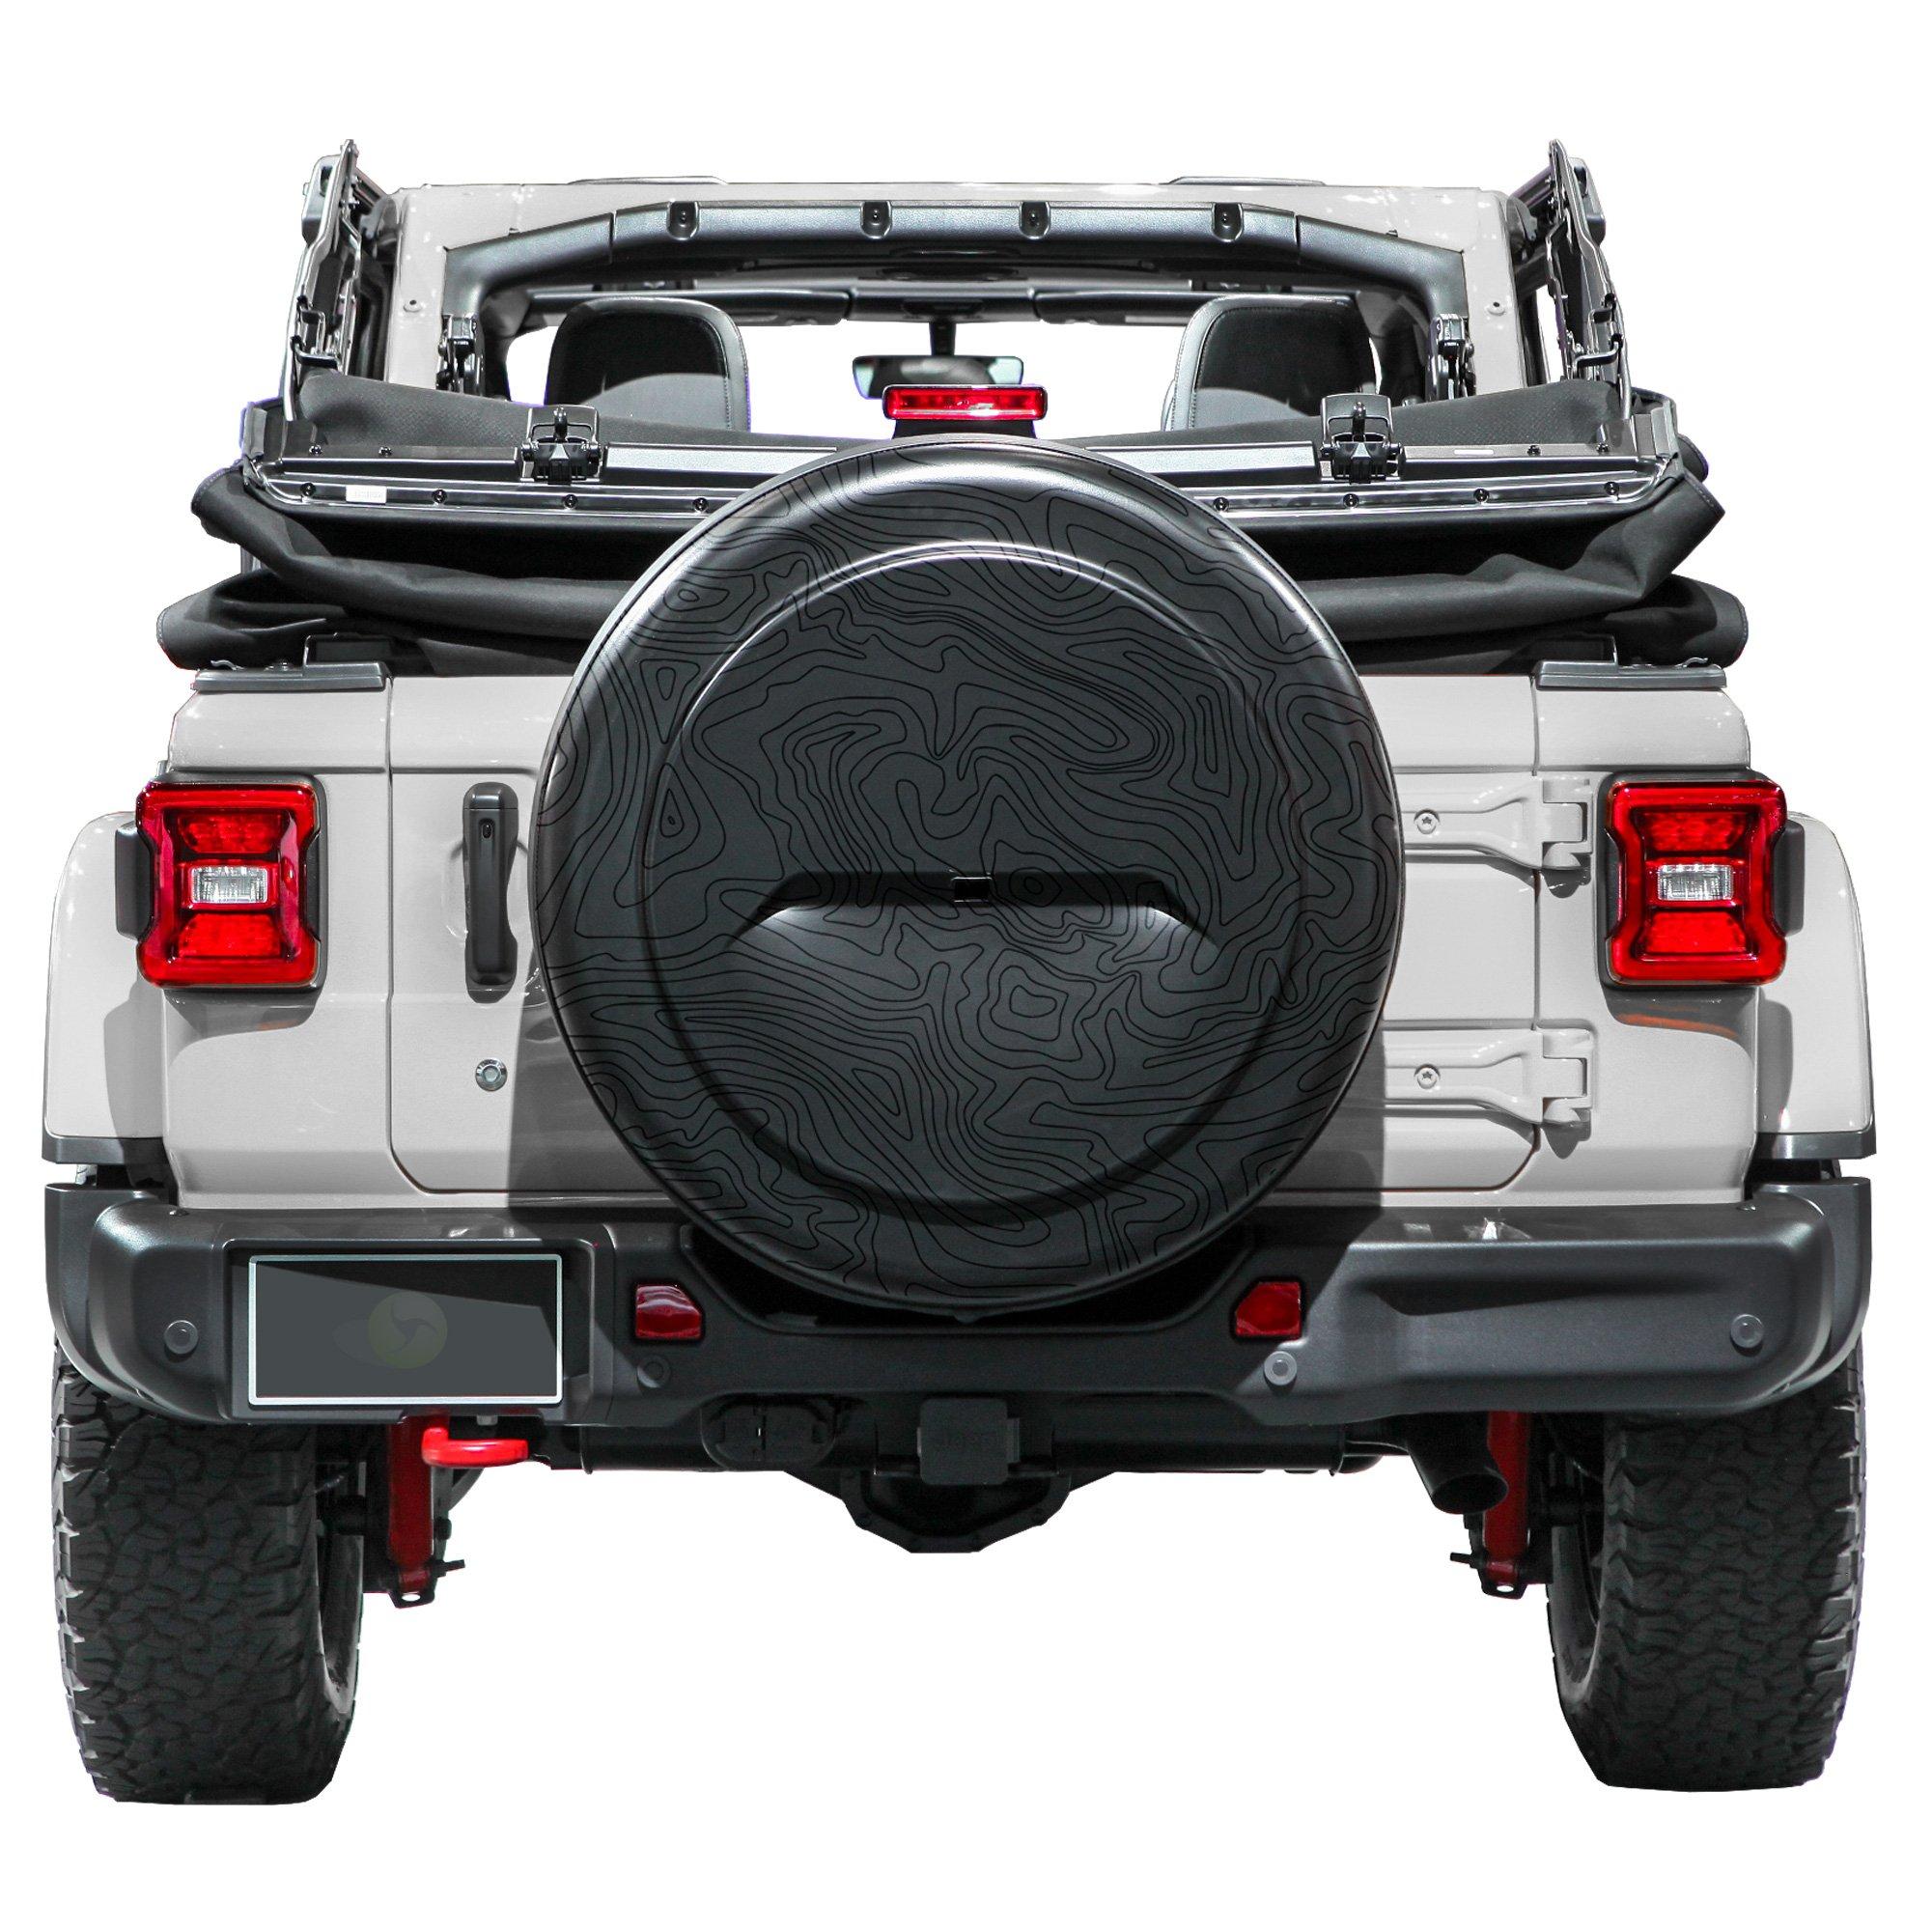 2018 Jeep Wrangler JL & JLU - 32'' Rigid Tire Cover (Plastic Face & Vinyl Band) - Topo Map Graphic